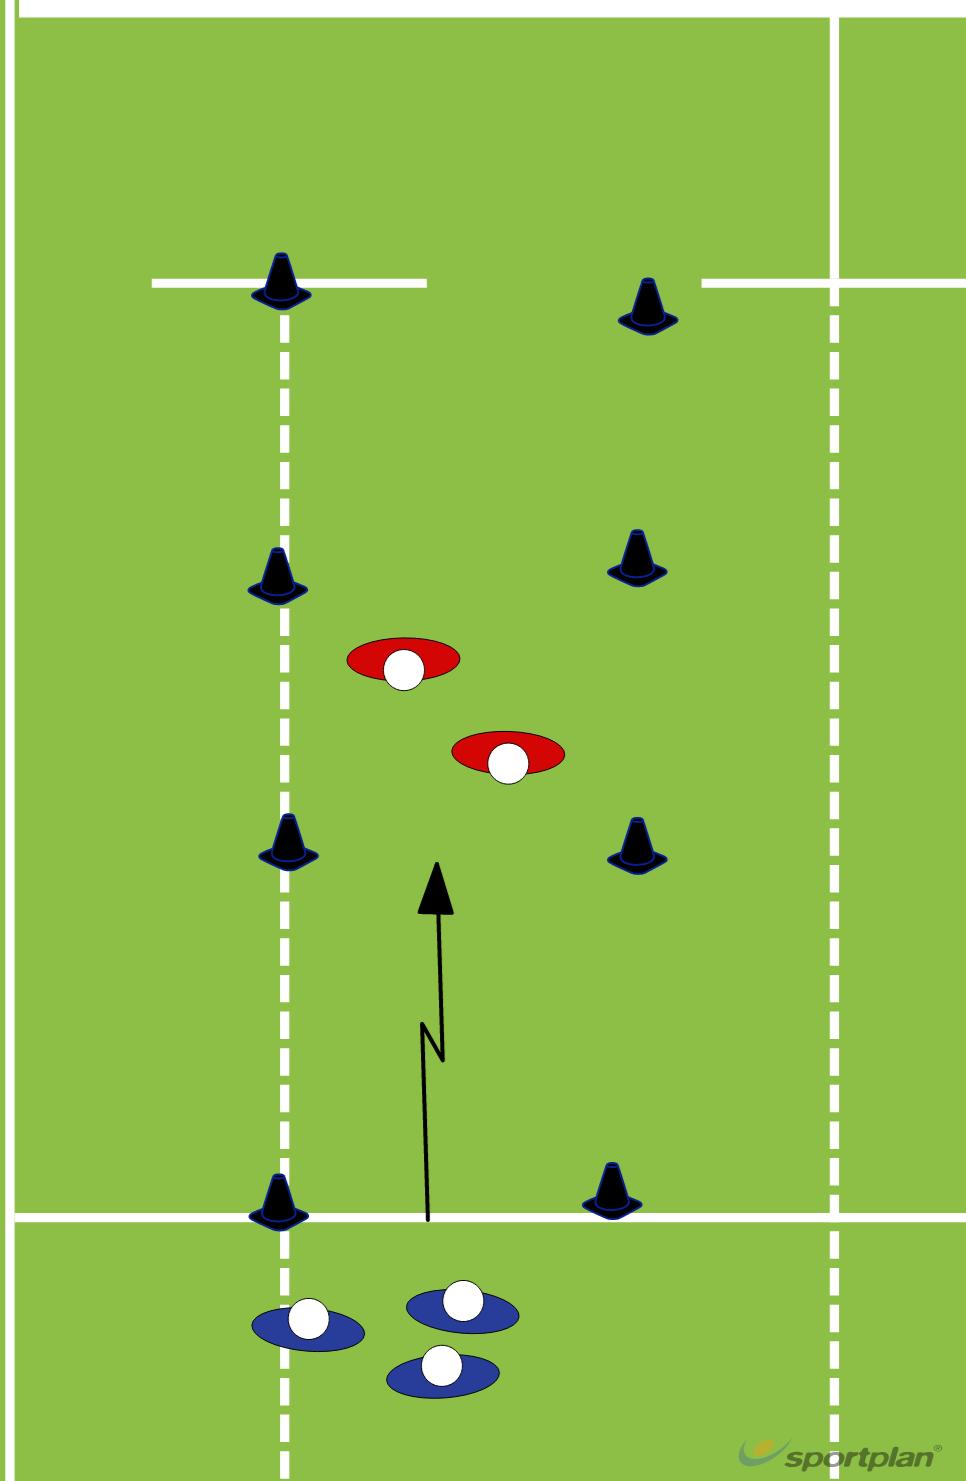 3v2 ruckingRuckRugby Drills Coaching